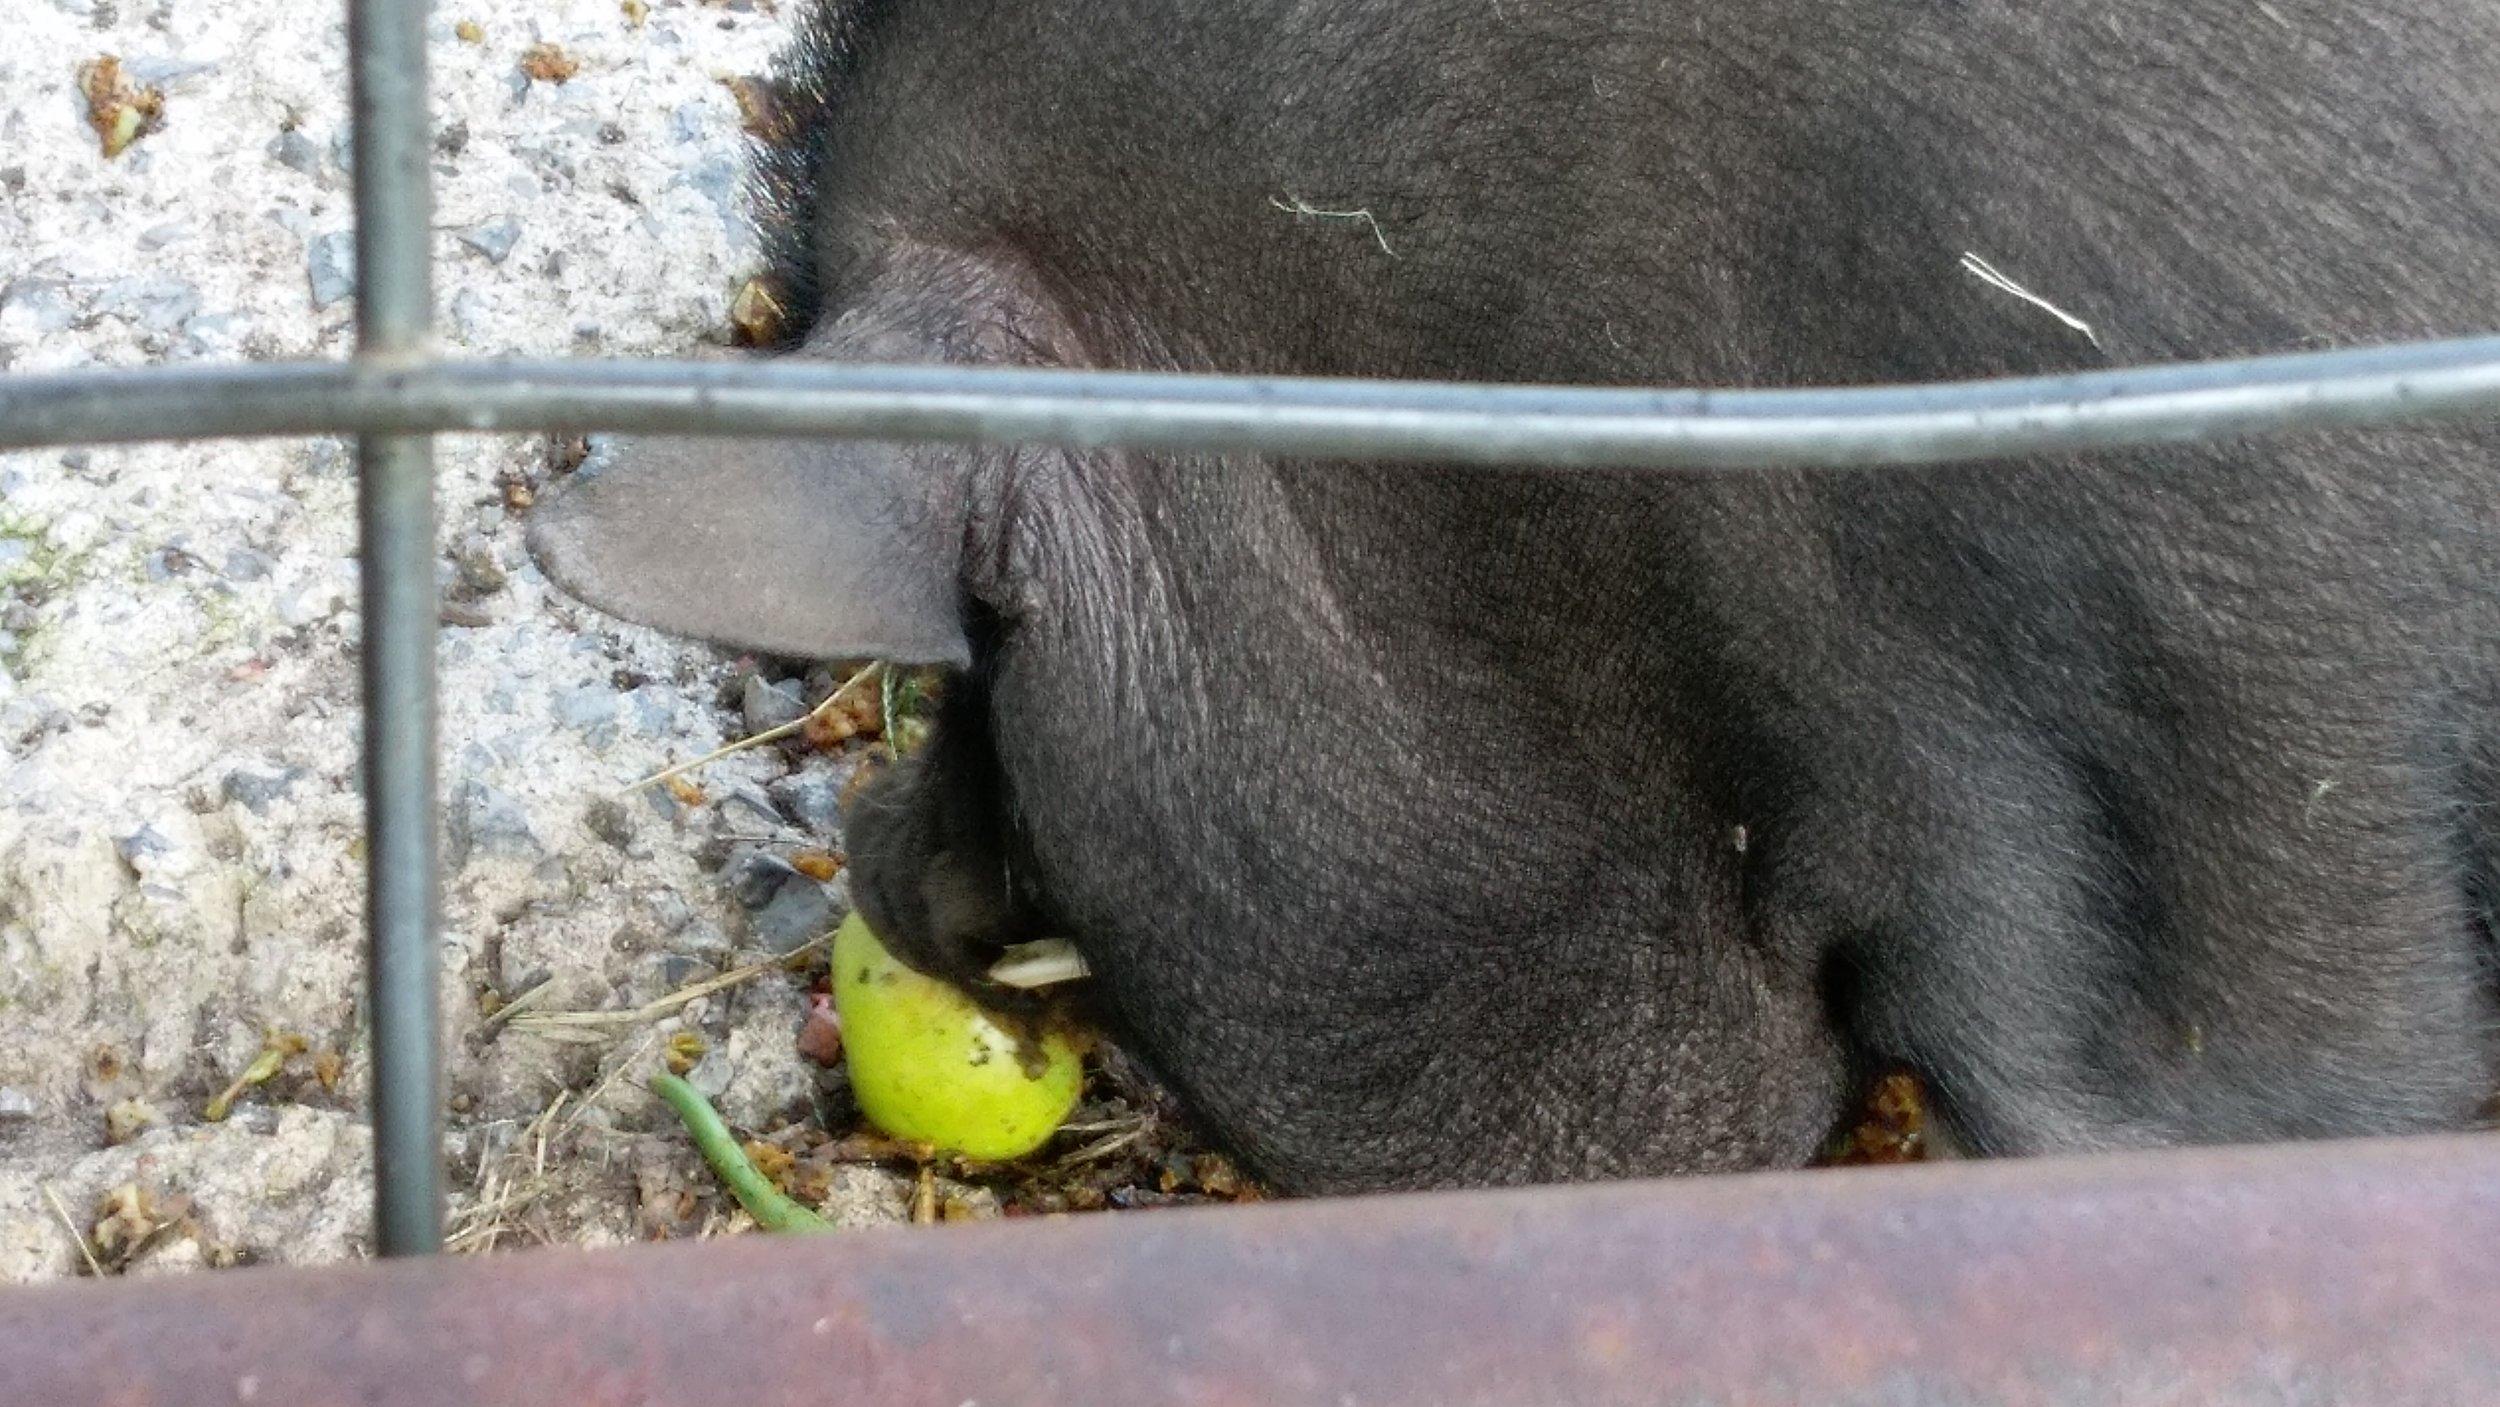 Pigs eating apples